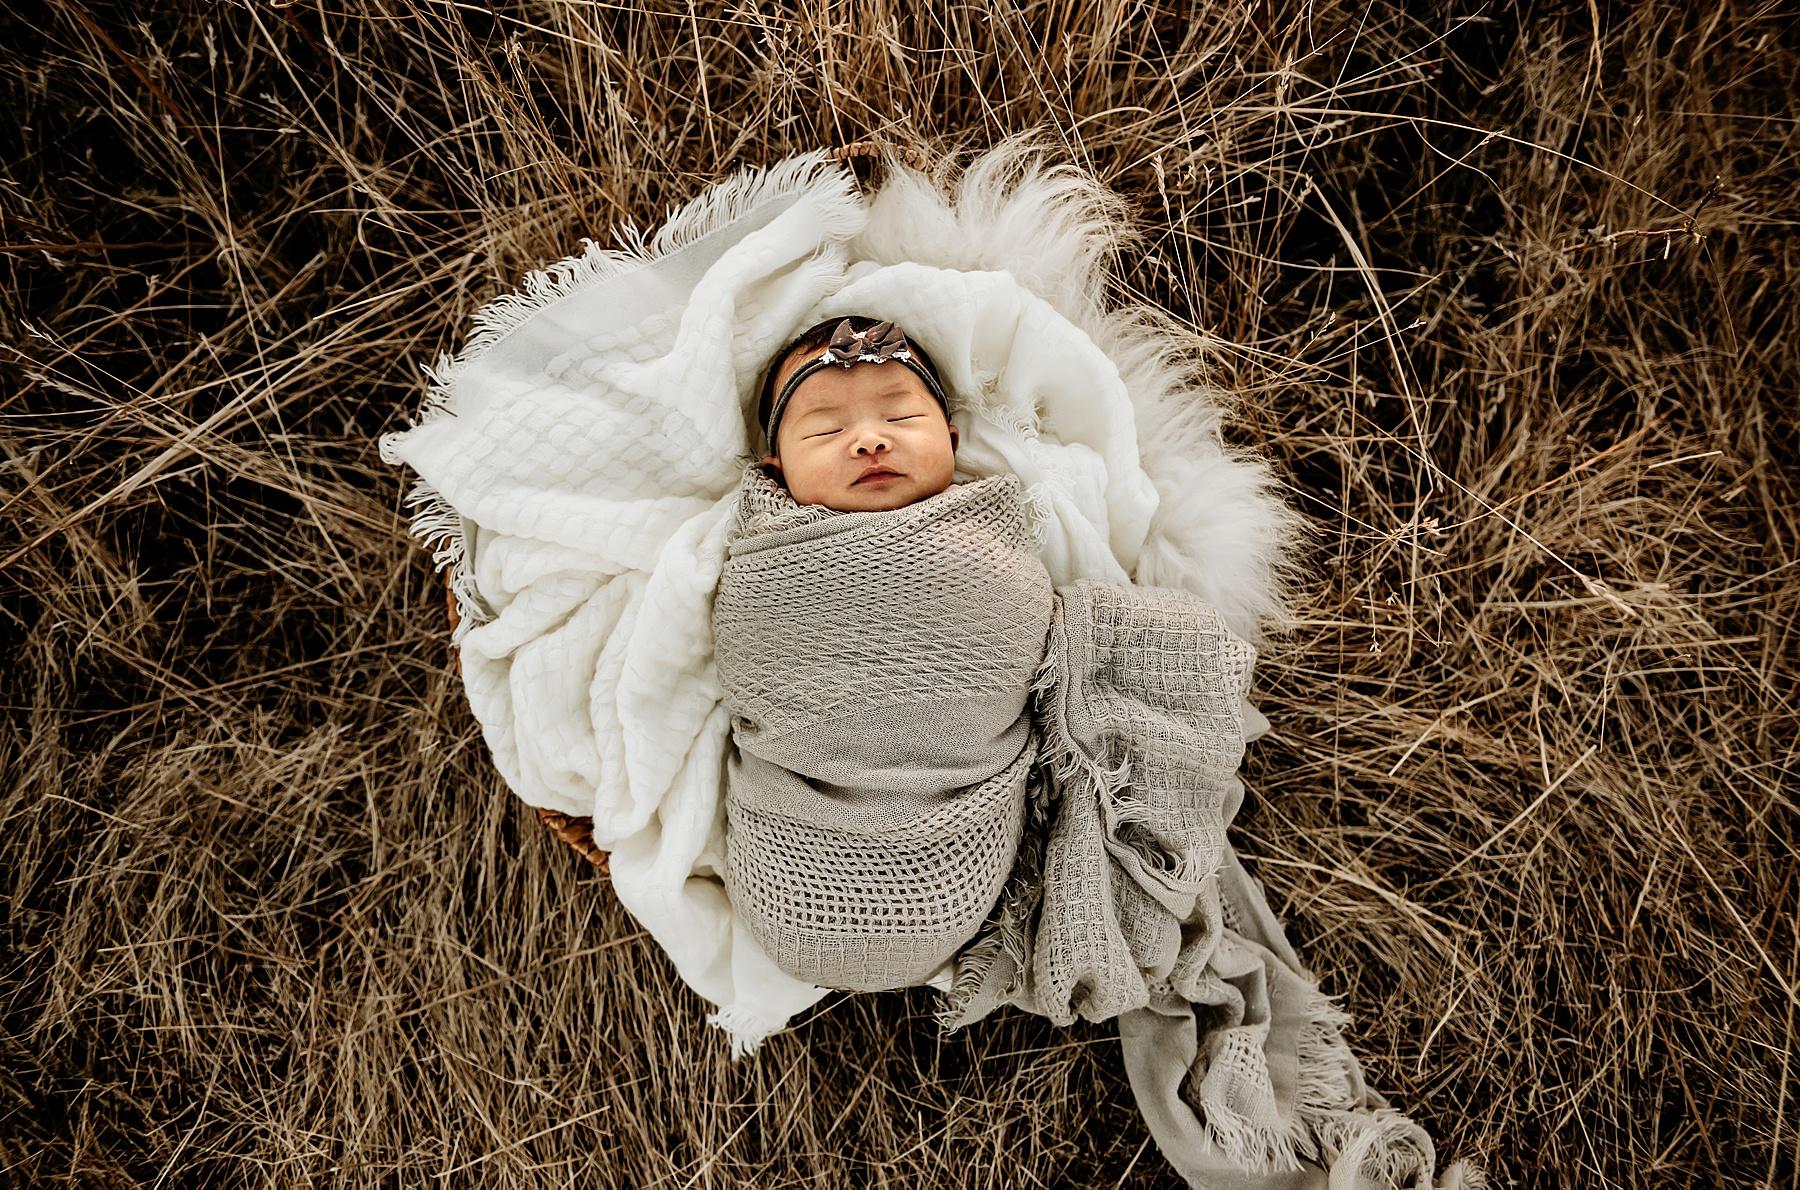 outdoor family newborn pictures baby girl in basket